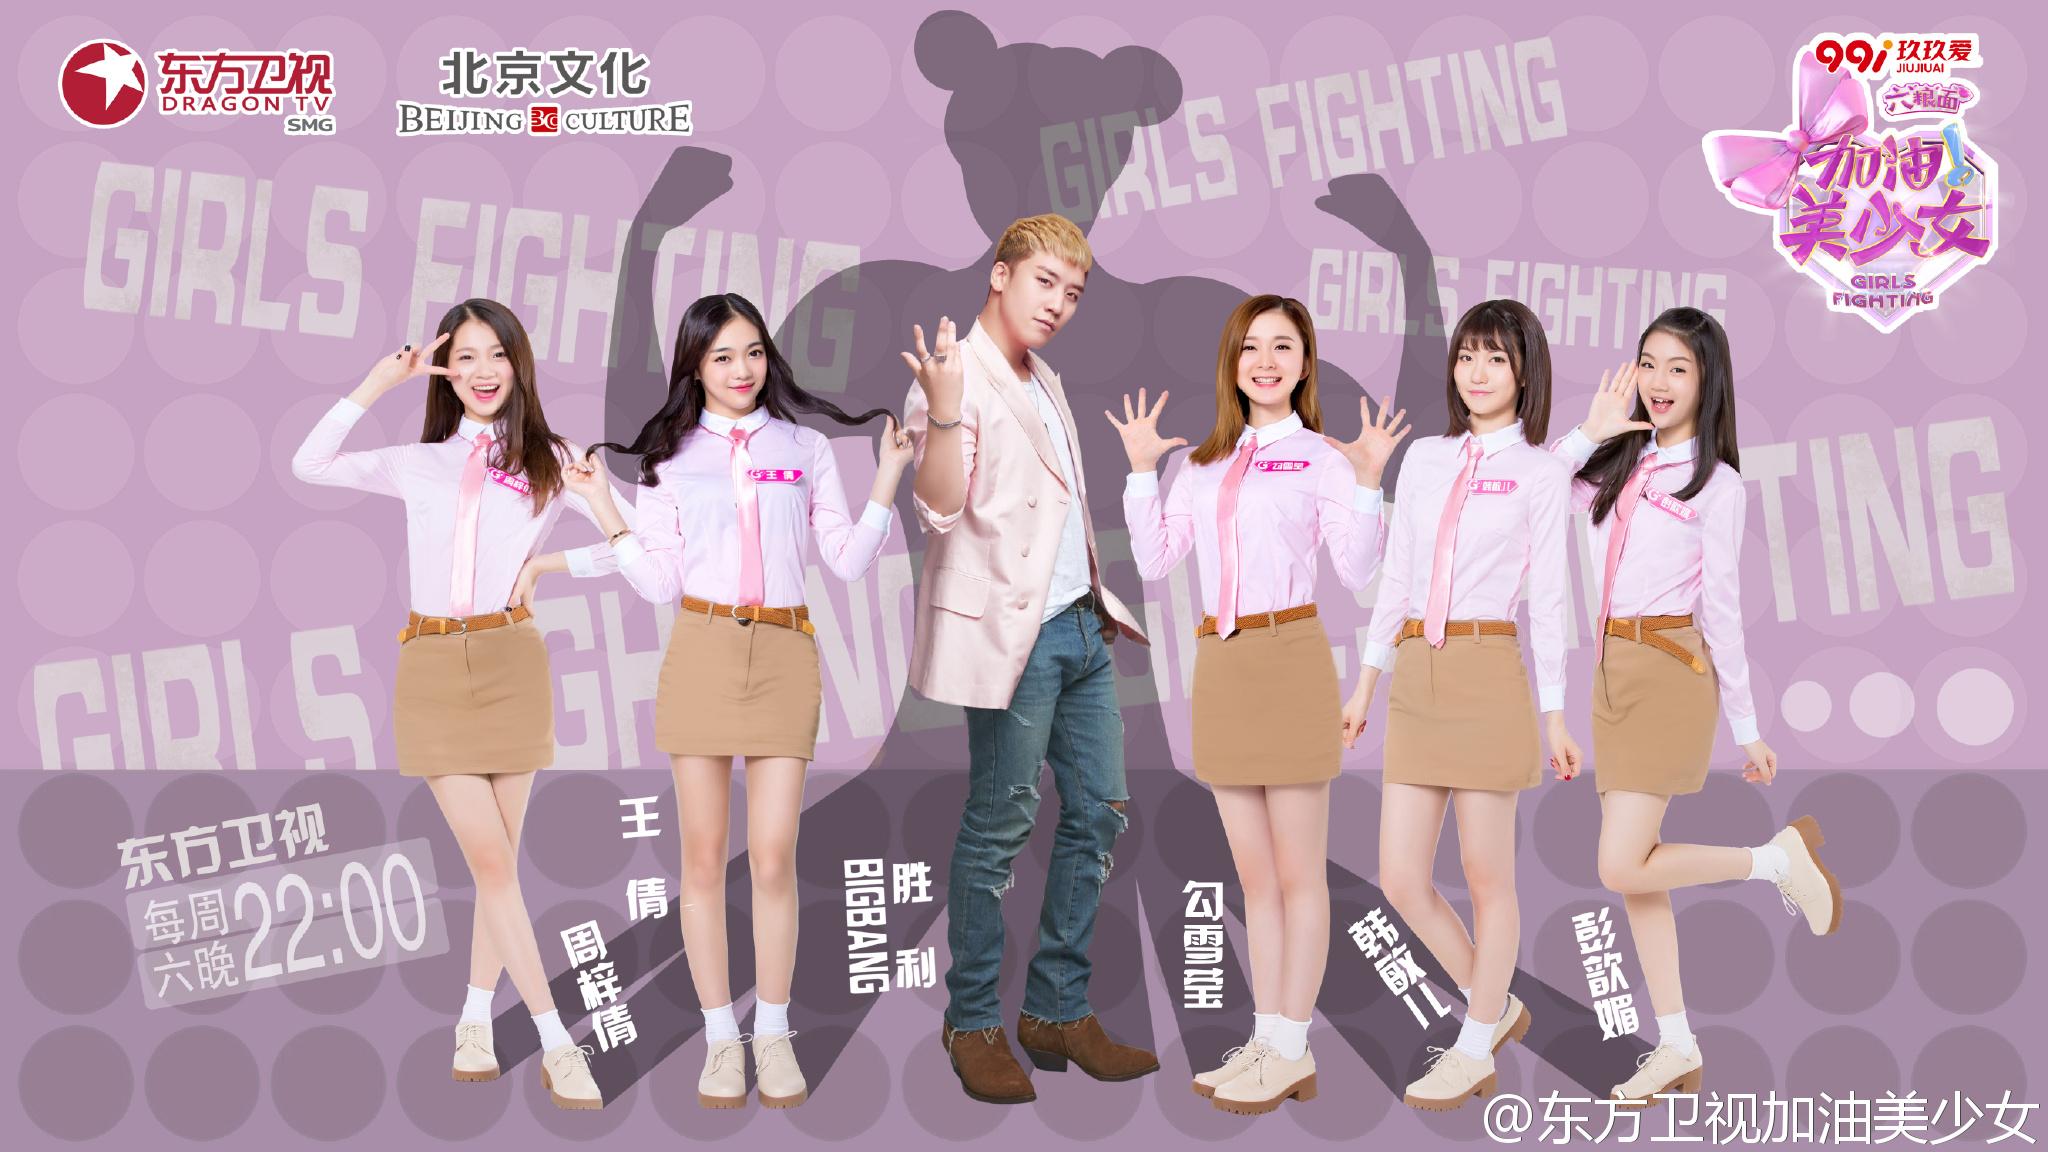 Seung Ri - Girls Fighting - 30jul2016 - 东方卫视加油美少女 - 03